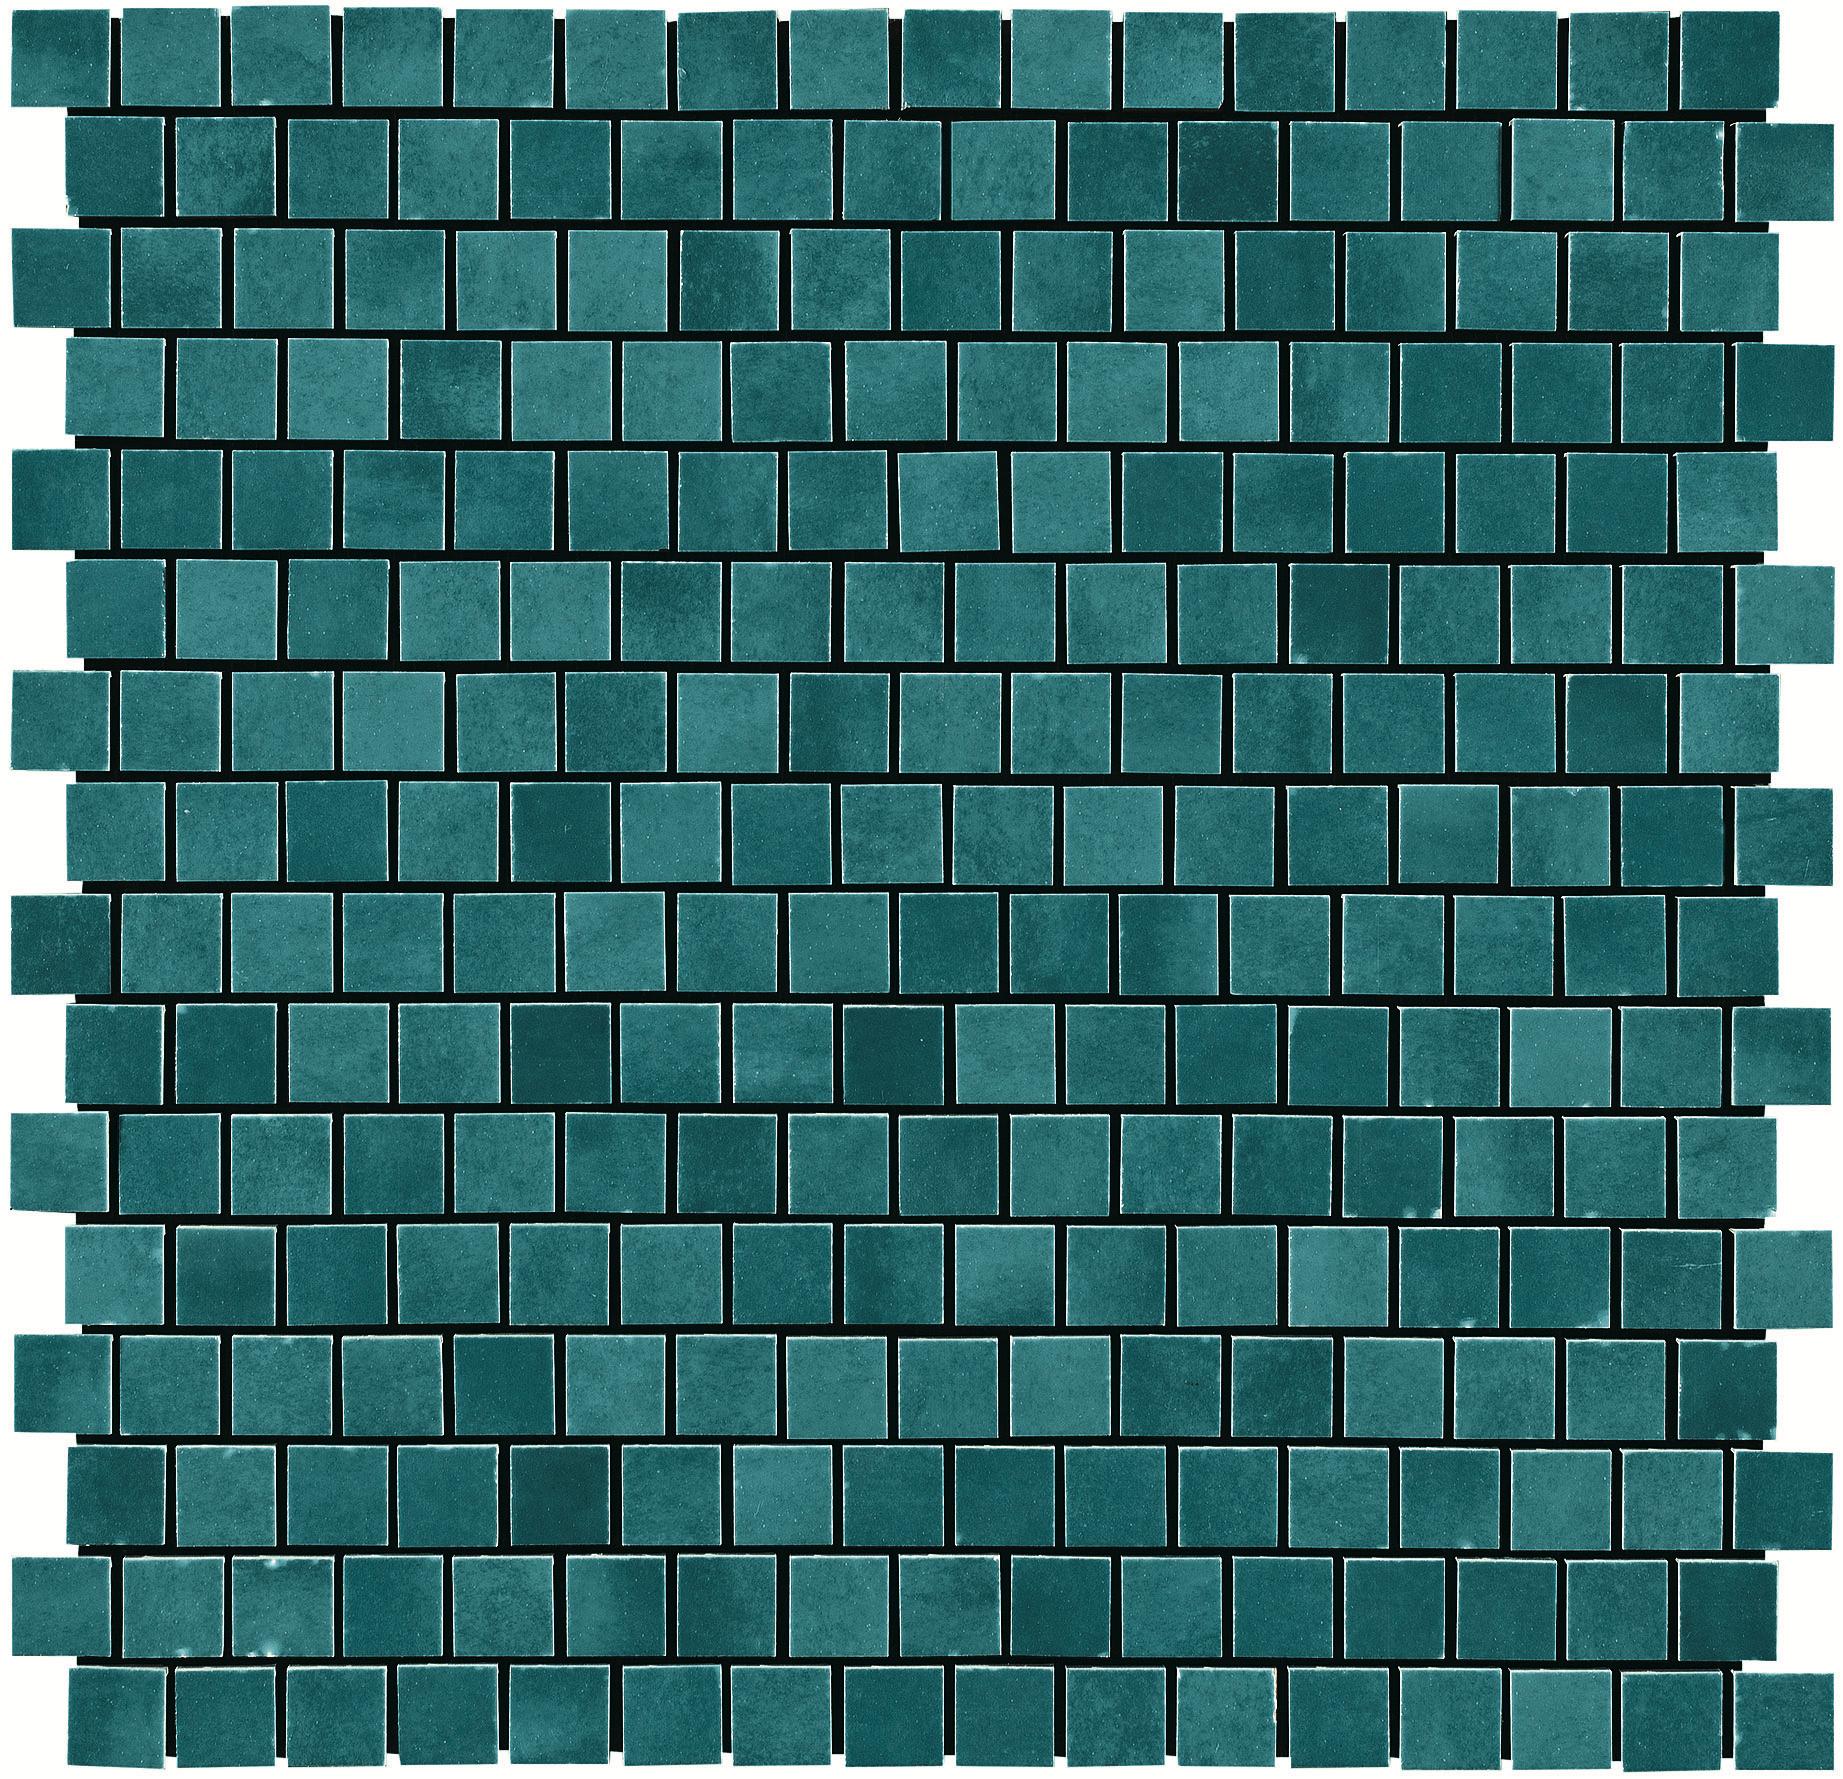 Mosaik 30OT dunkelgrün 30x30cm Mosaike